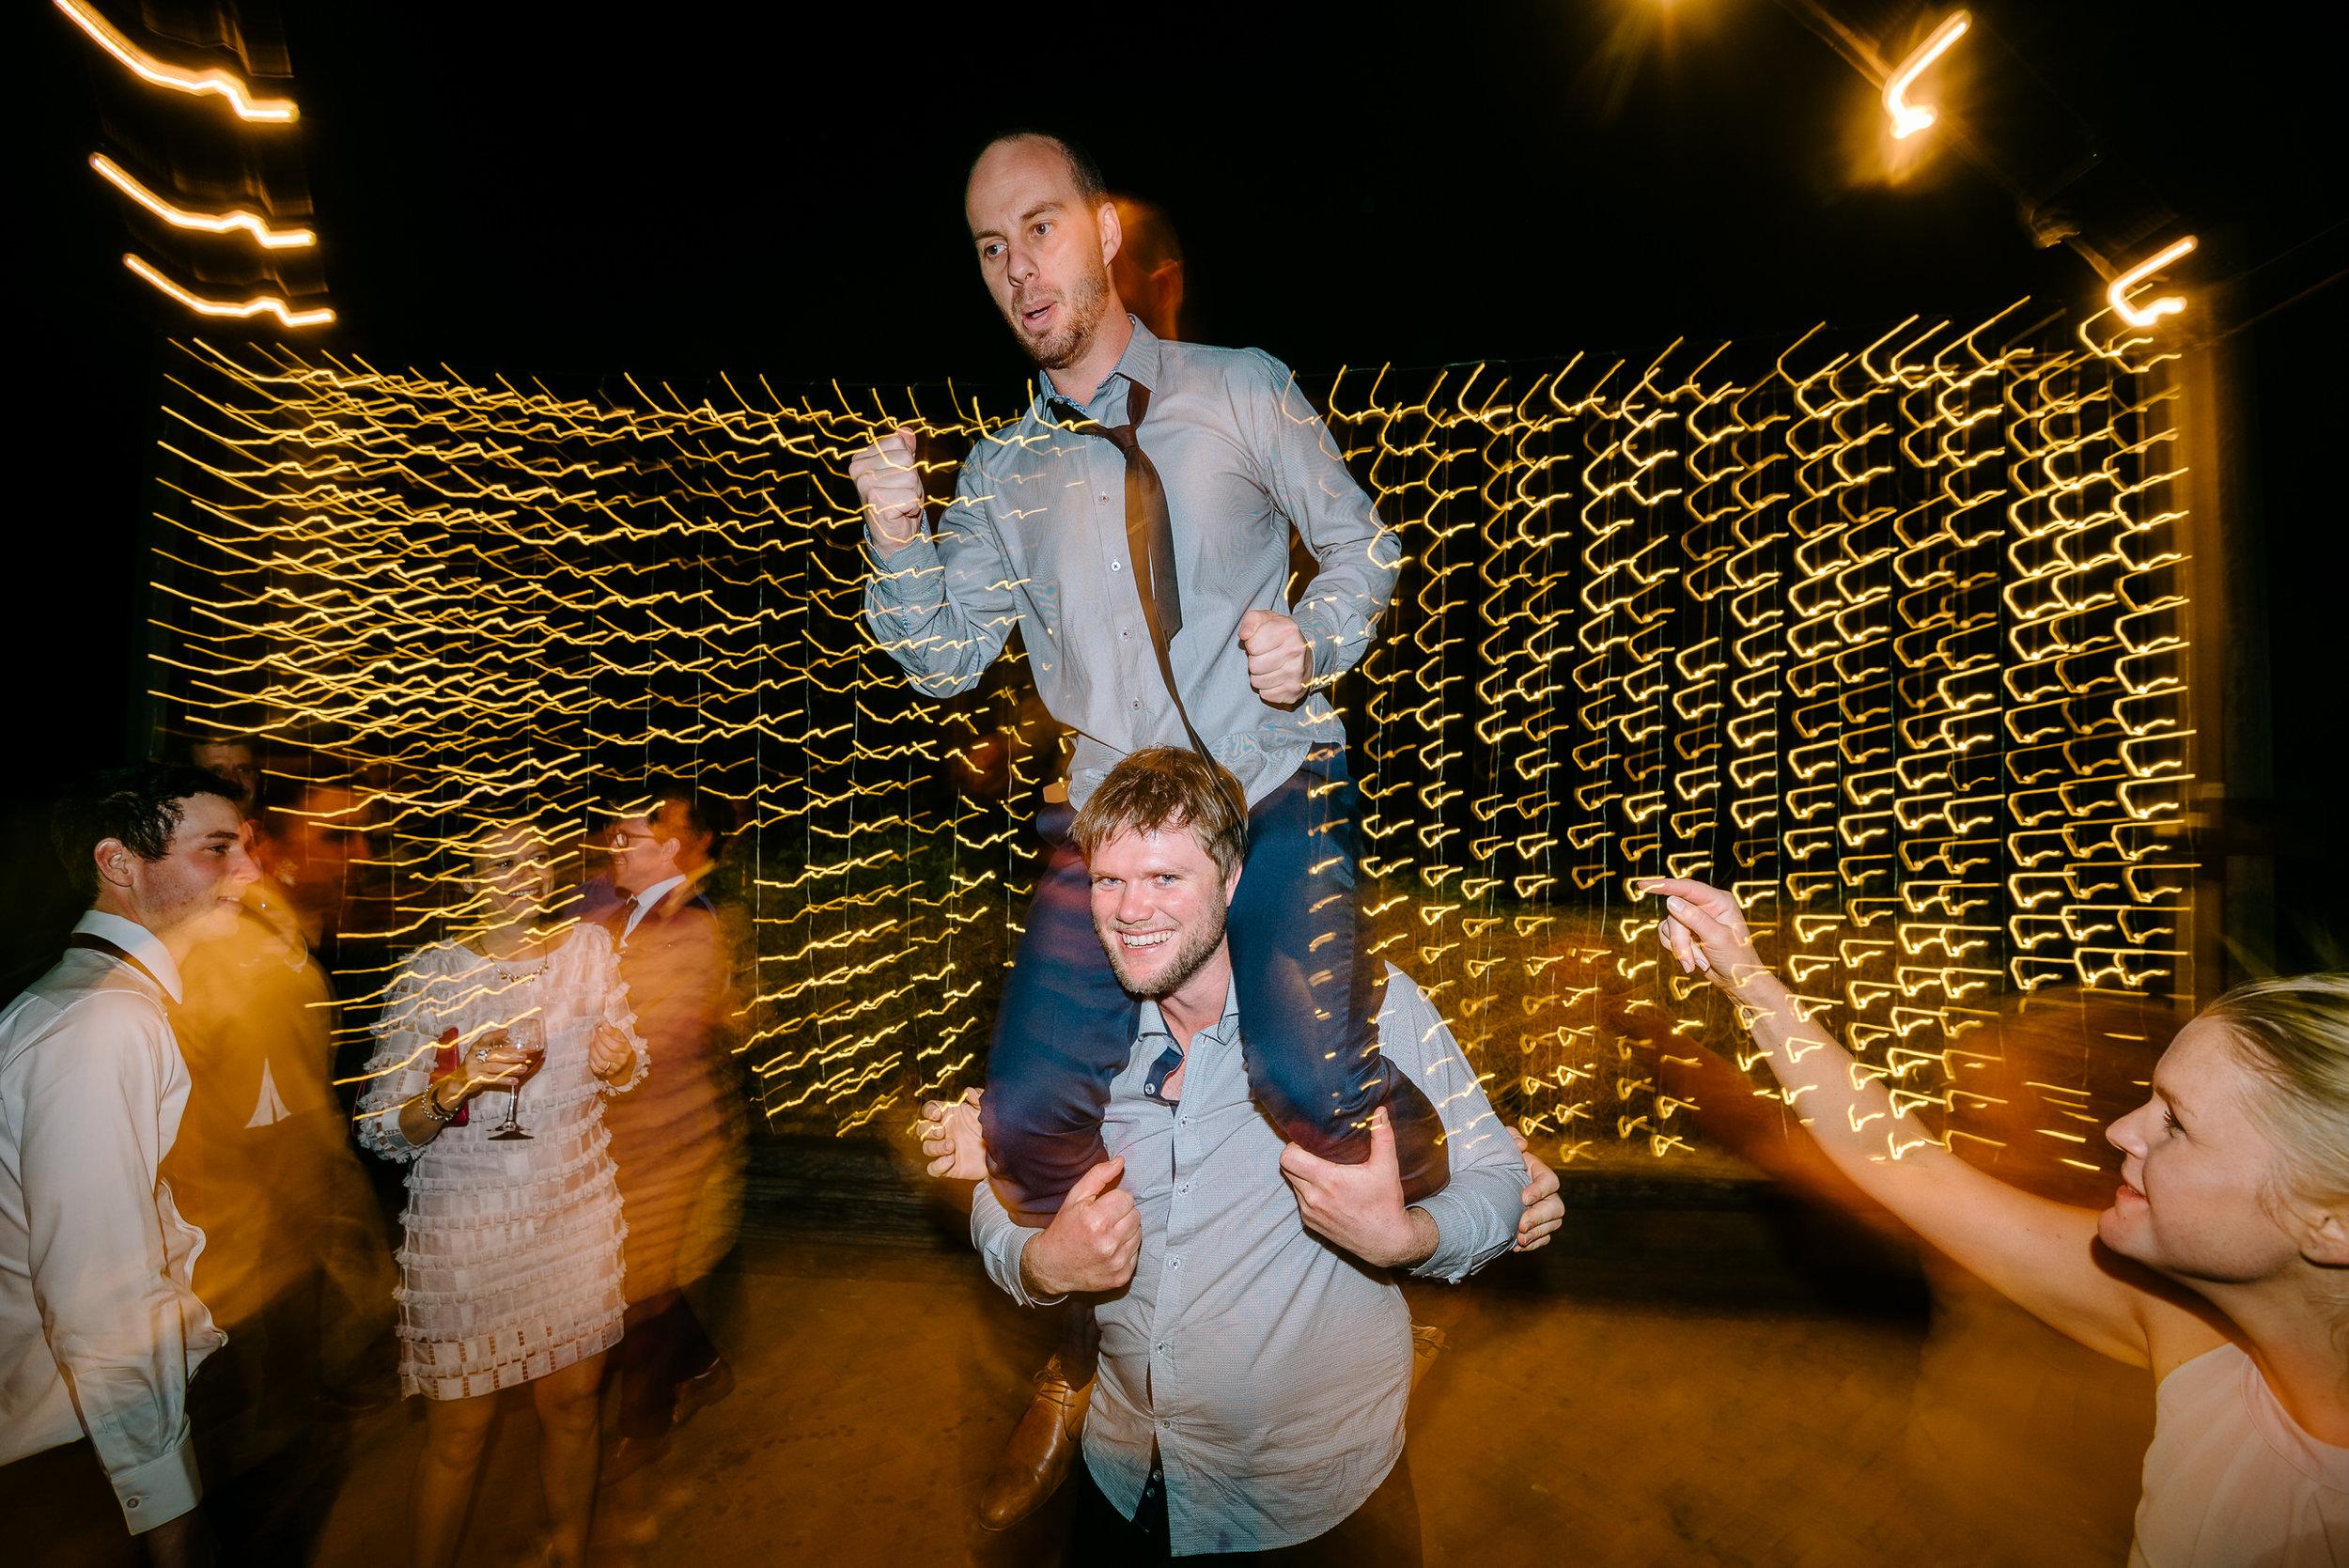 Justin_And_Jim_Photography_Byron_Bay_Wedding118.JPG